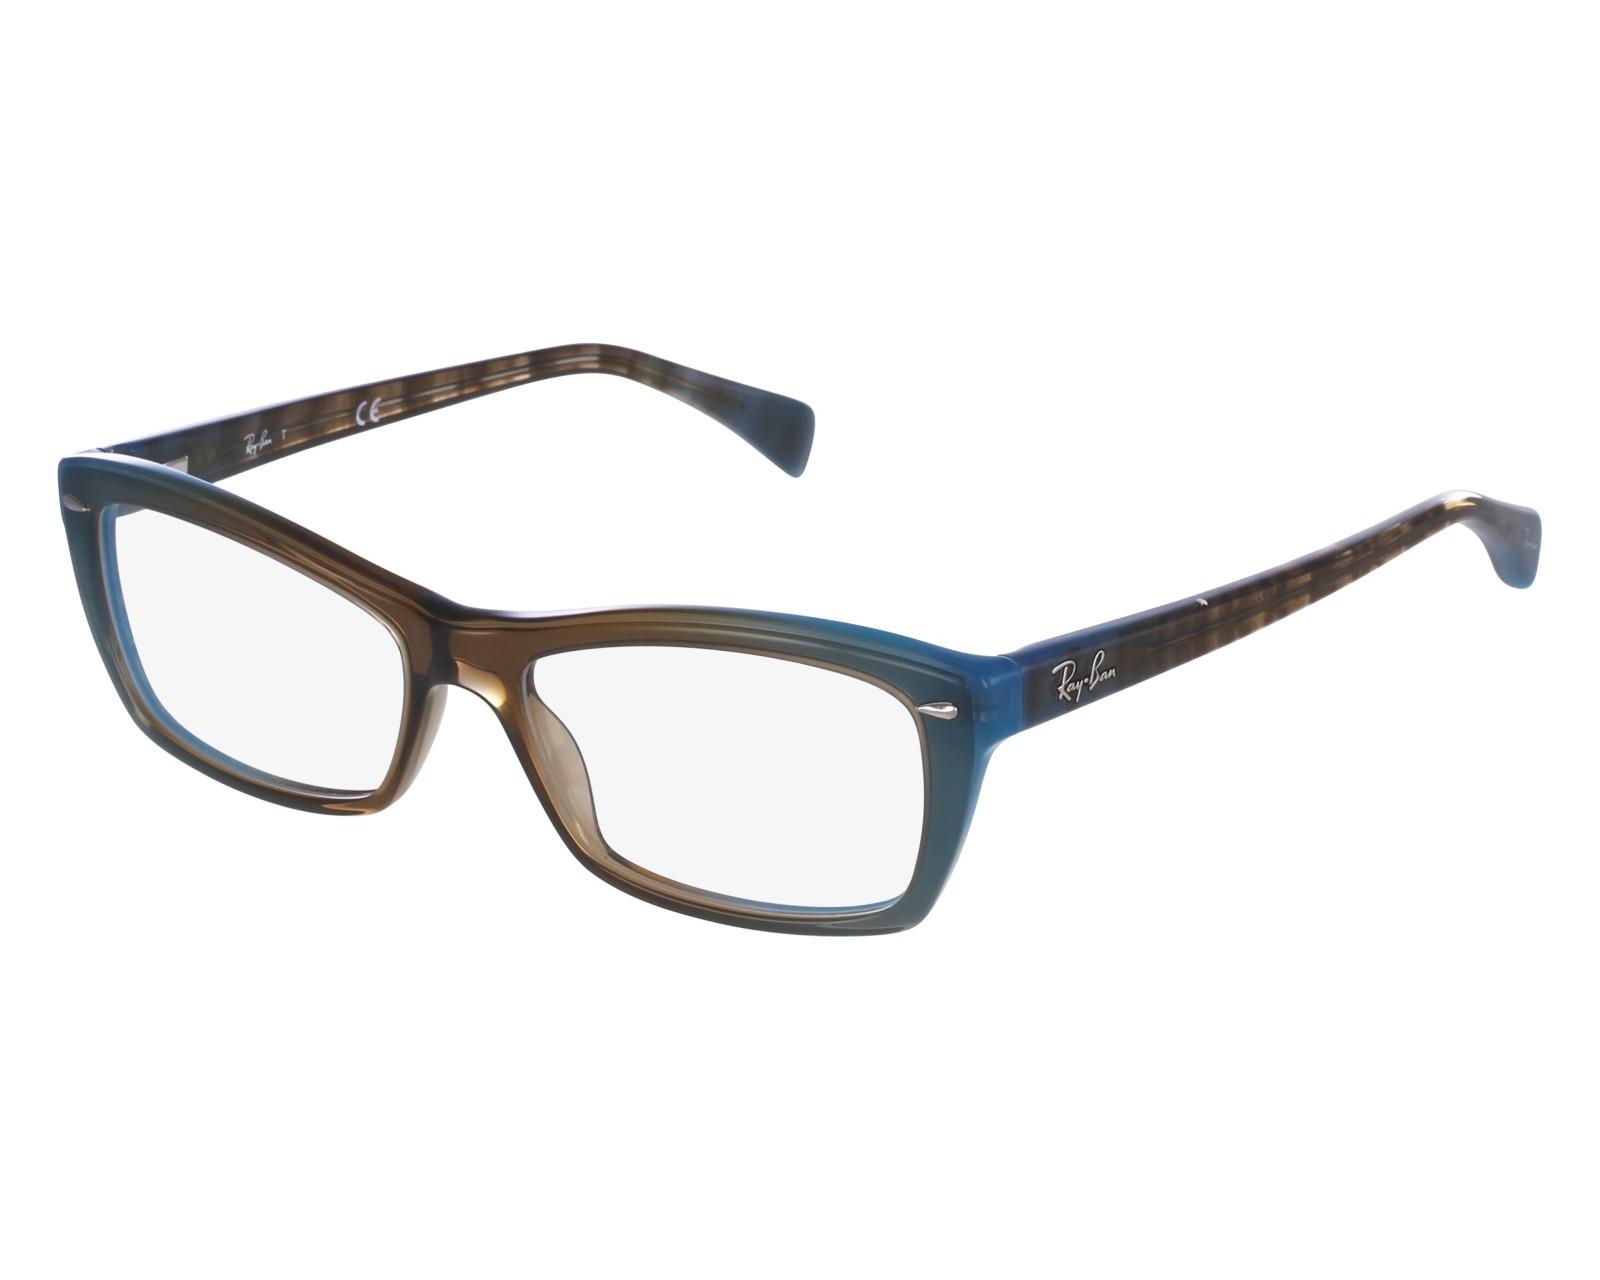 99fcff671c Gafas Graduadas Ray-Ban RX-5255 5490 - Turquoise Marrón vista de frente